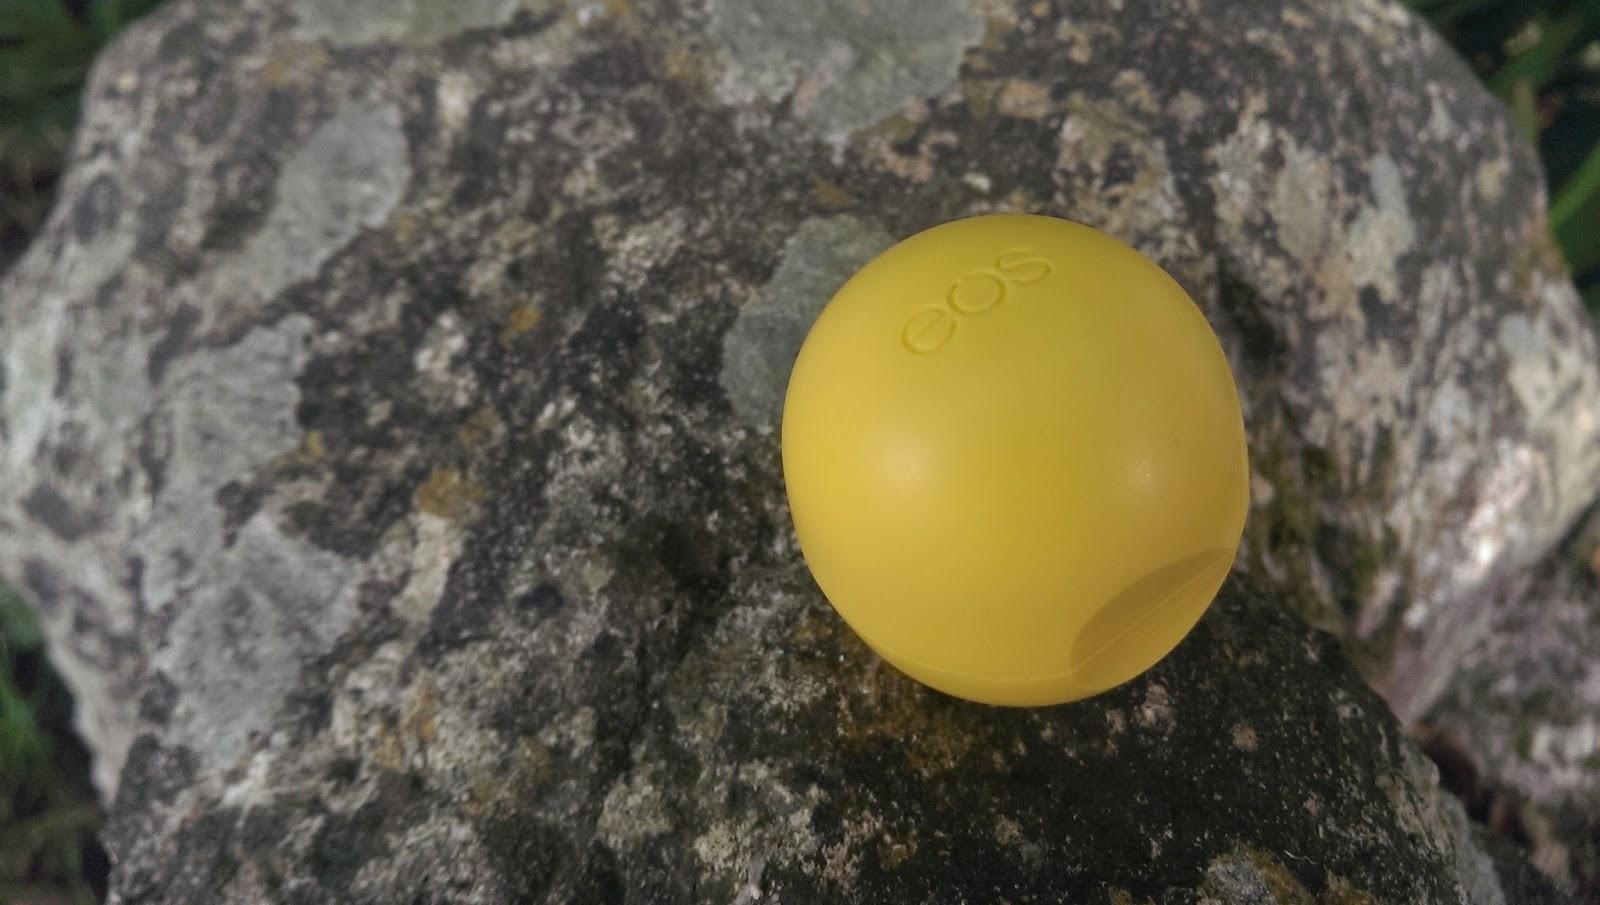 Lemon drop EOS lip balm closed and on a rock